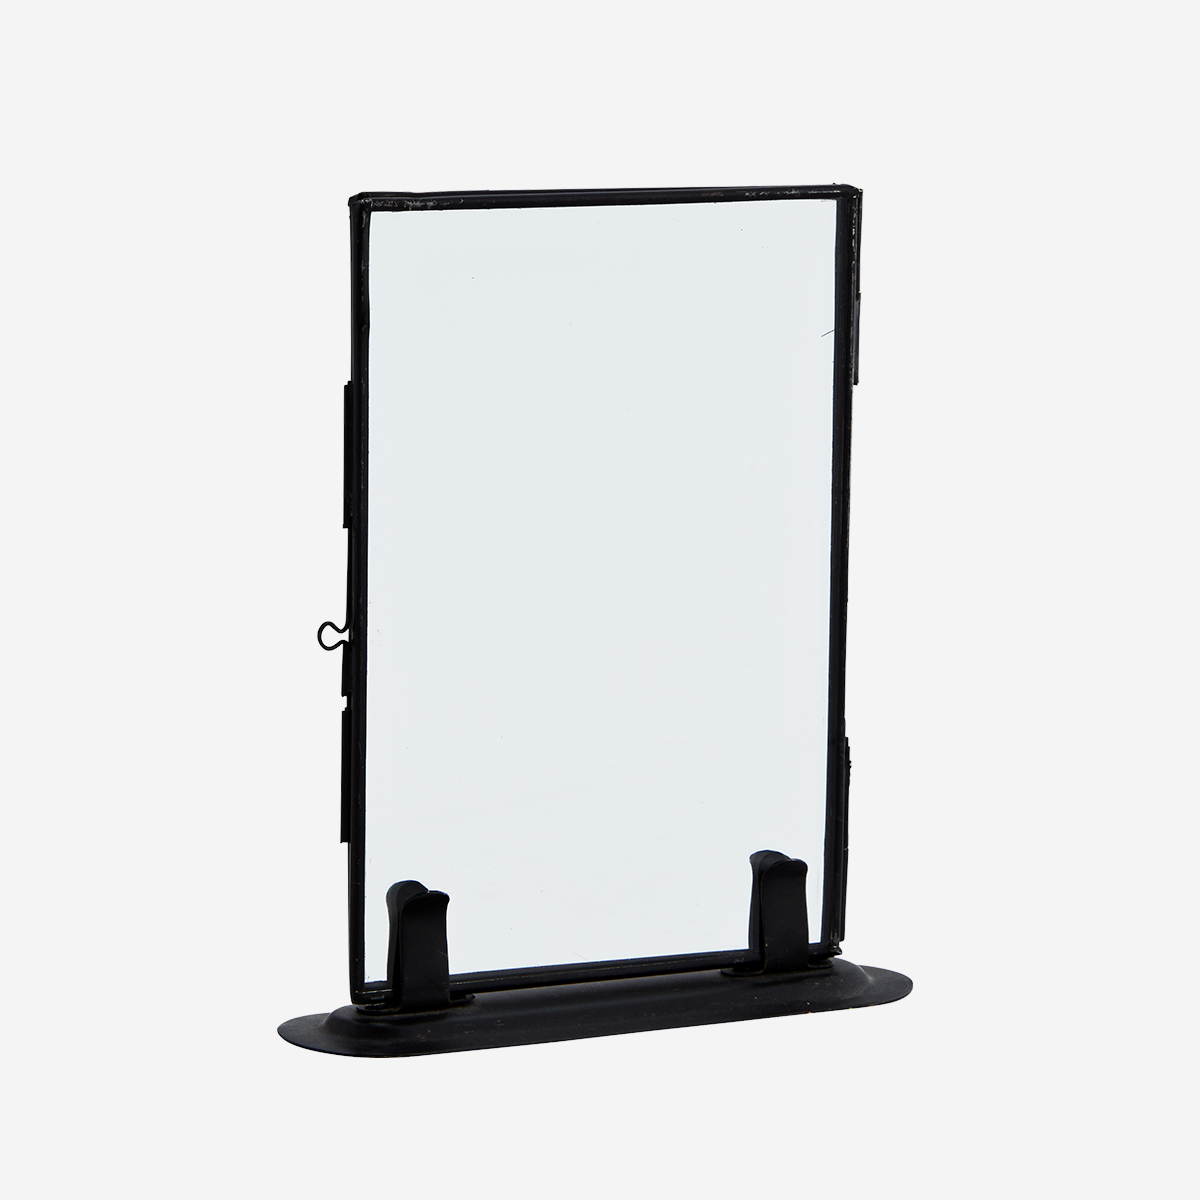 Photoframe on Stand